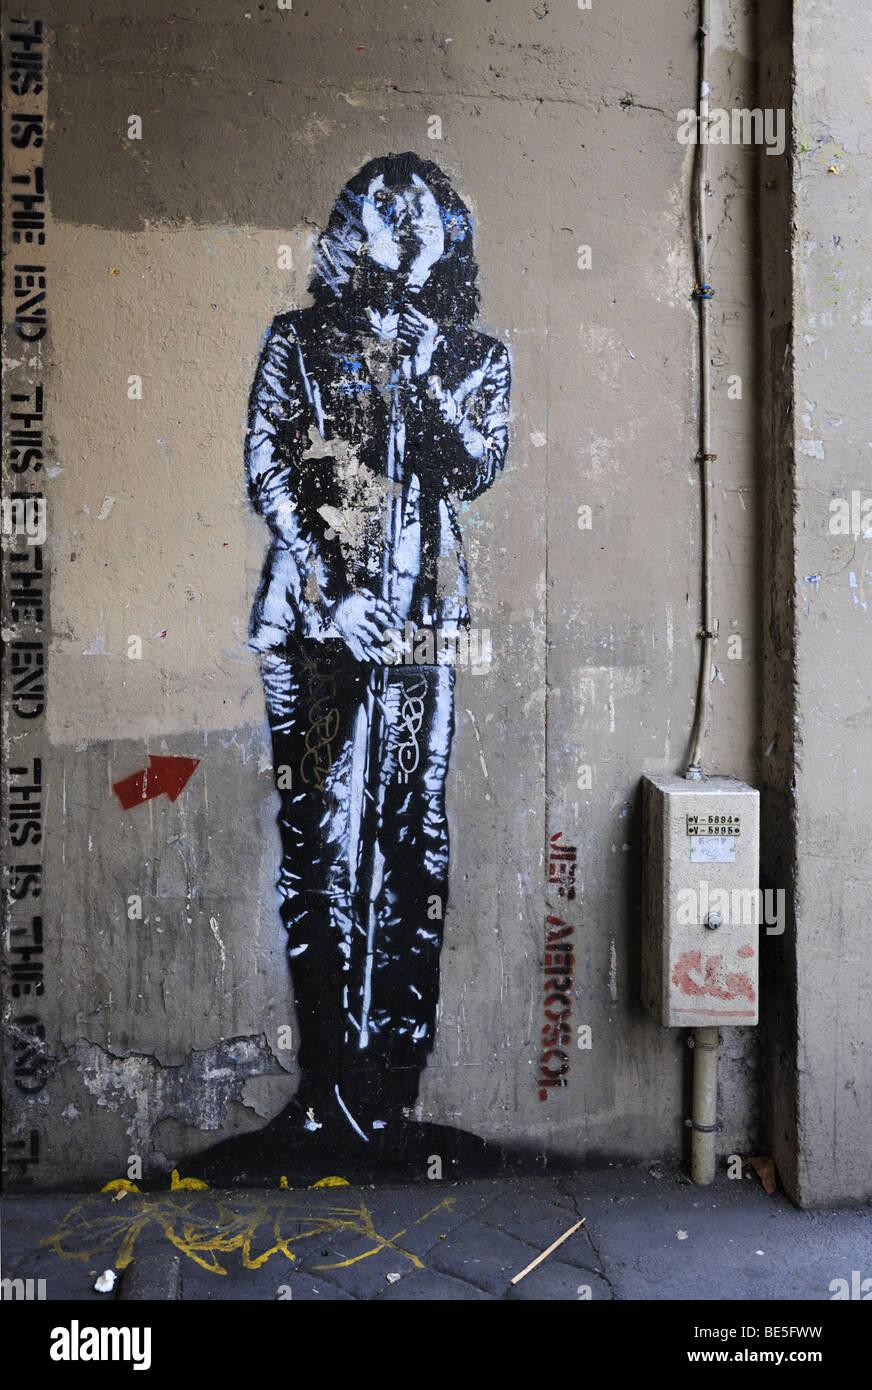 Wall painting of Jim Morrison of the Doors, Jardin des Plantes Quarter, Paris - Stock Image